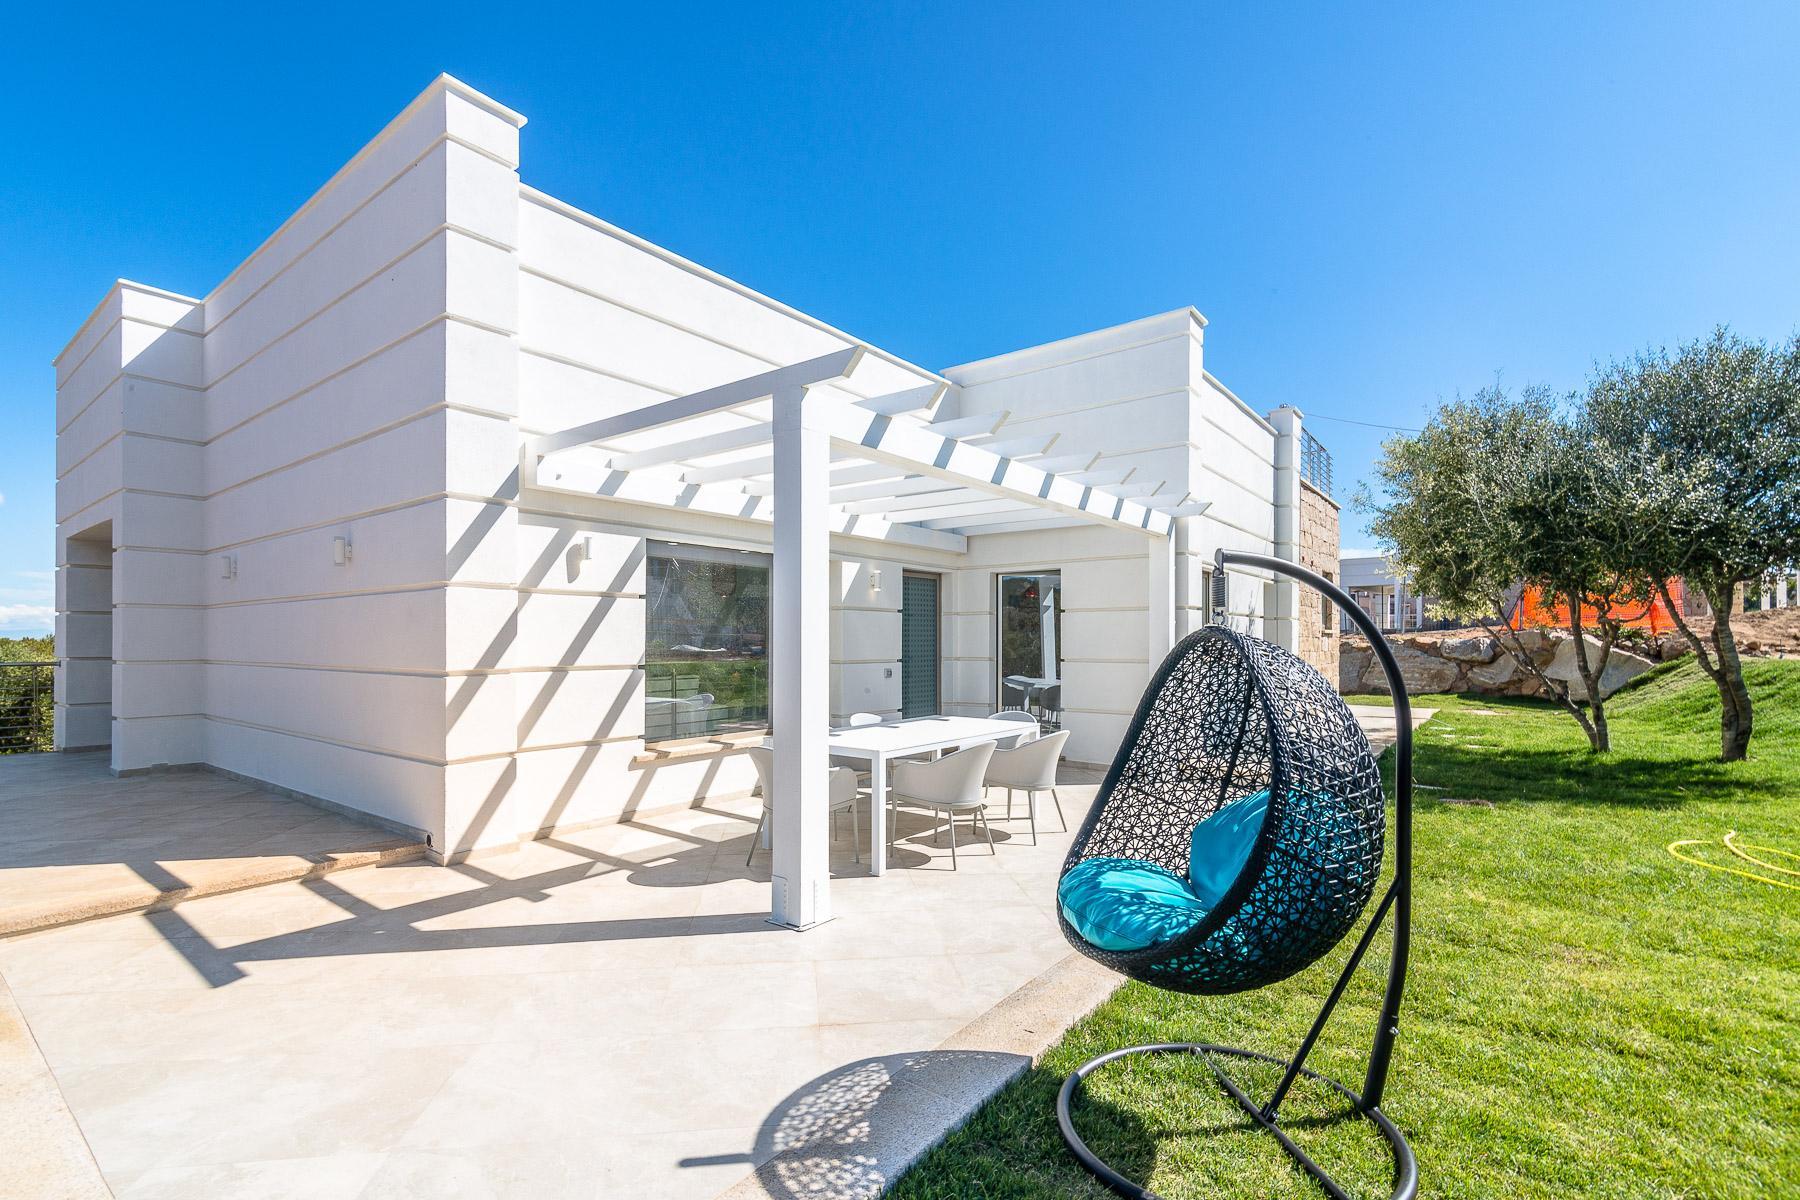 Pegasus Gorgeus Villa with swimming pool immersed in mediterranean fragrances - 12